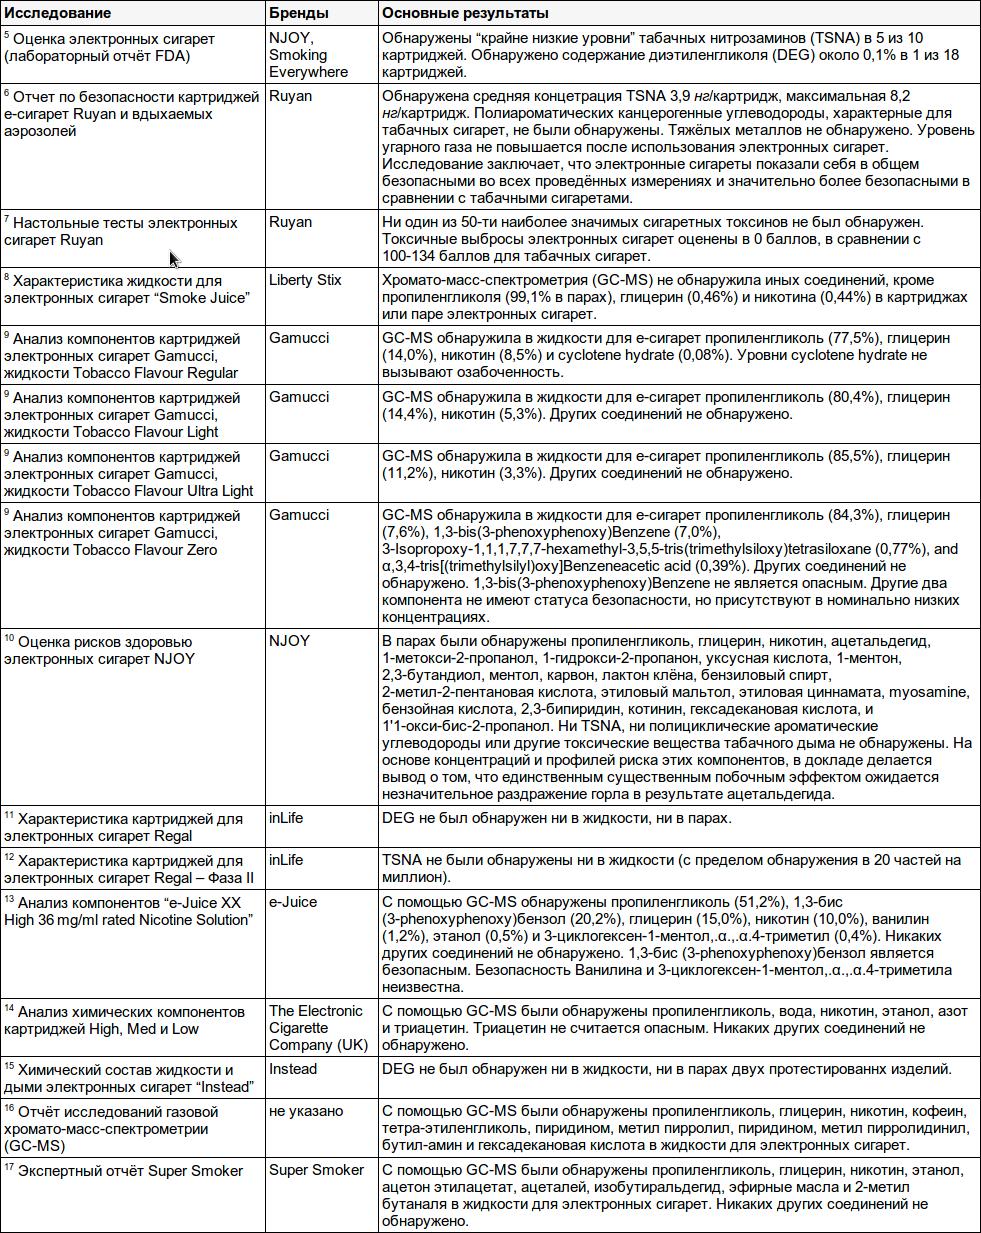 ecig-table1.png